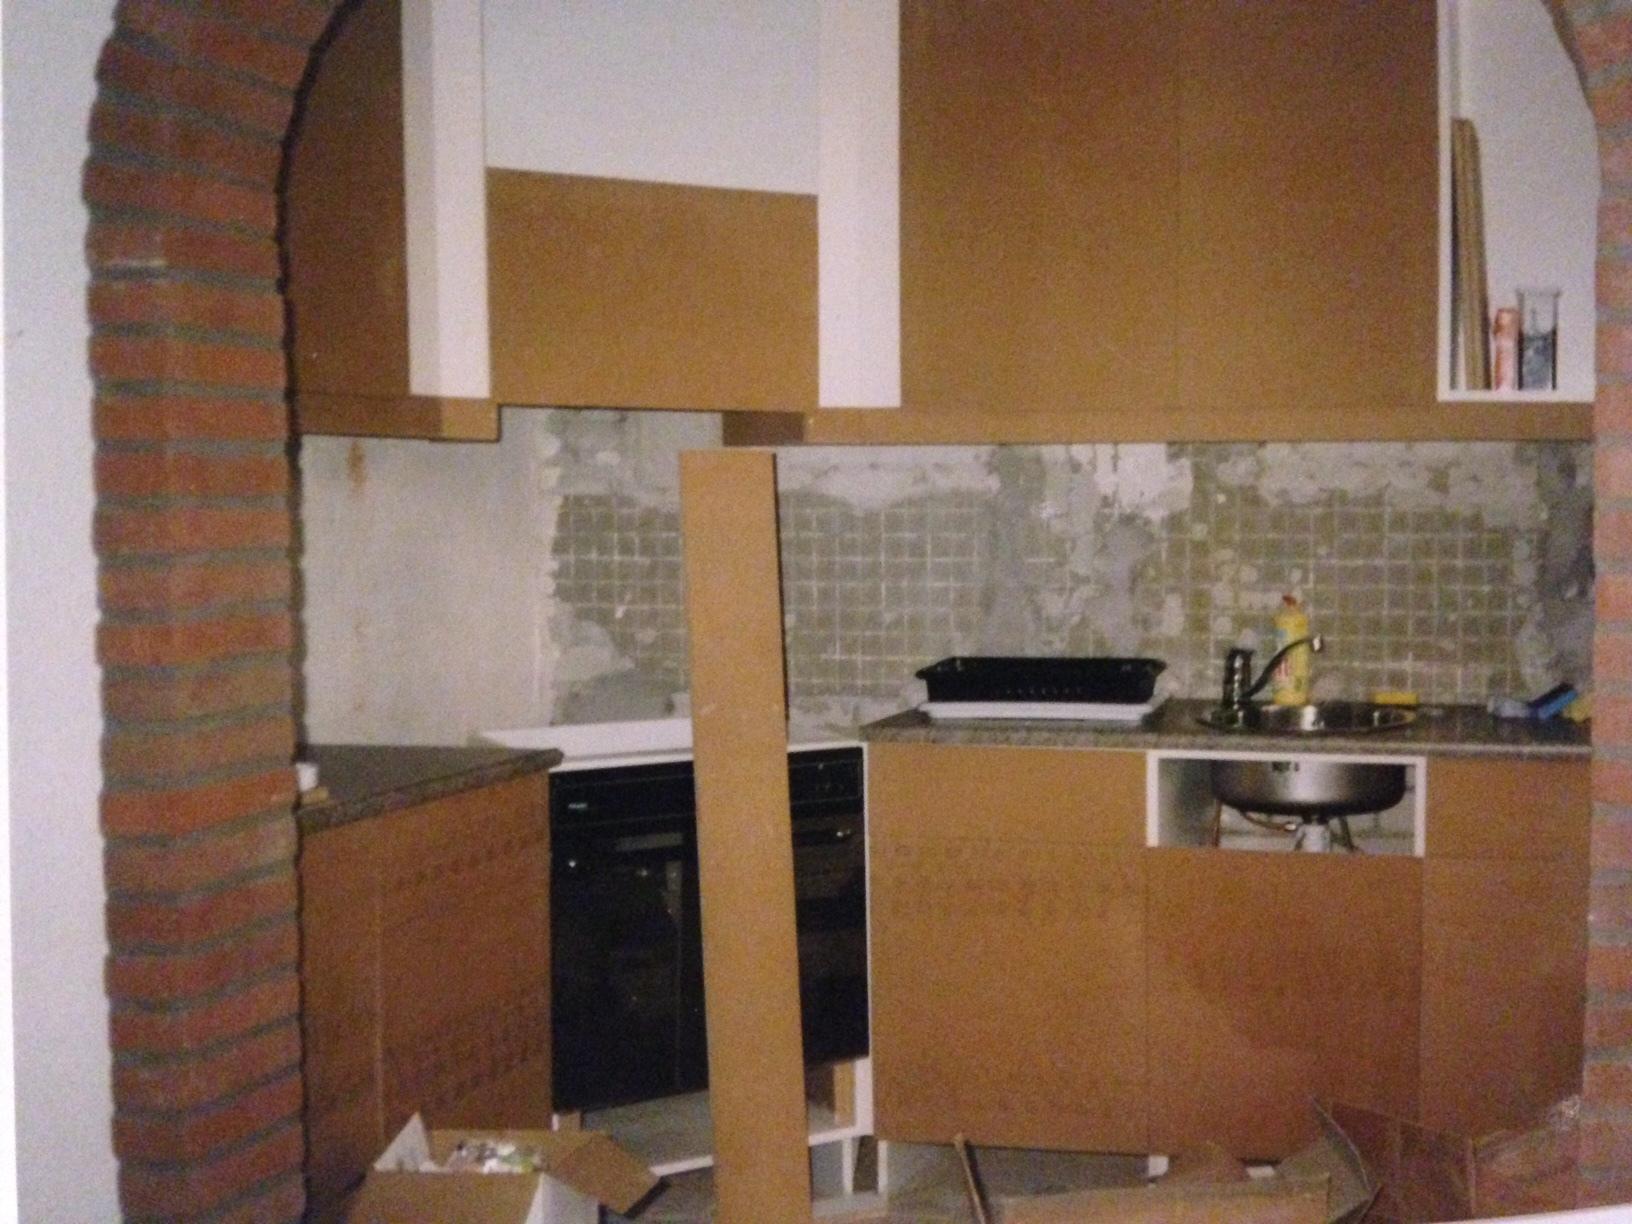 Oude keuken omtoveren naar een moderne keuken - Moderne oude keuken ...